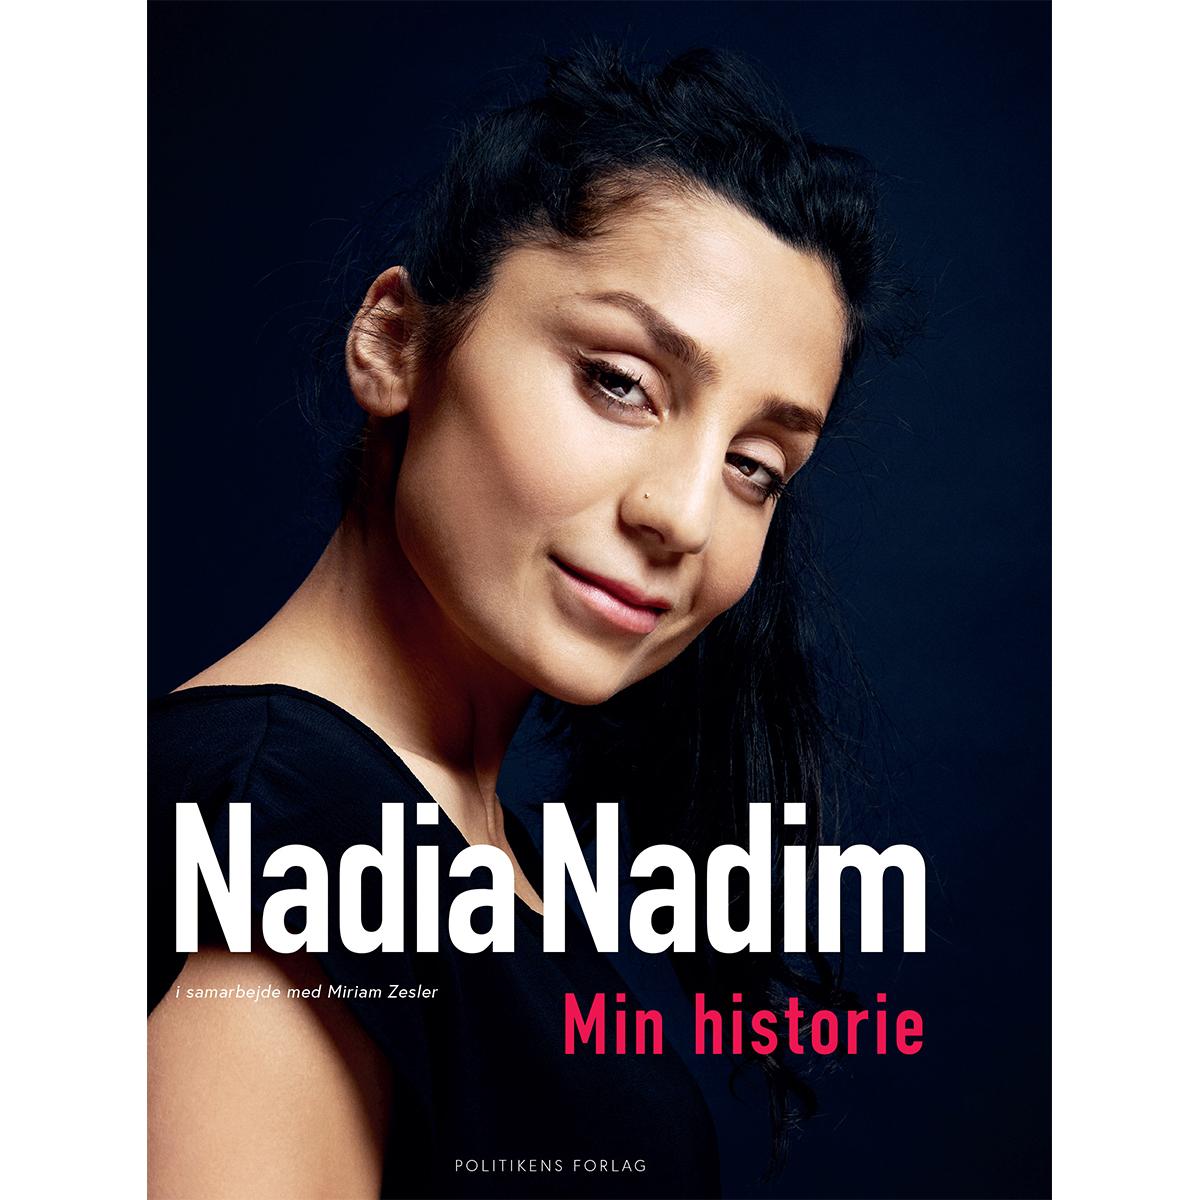 Nadia Nadim - Hæftet